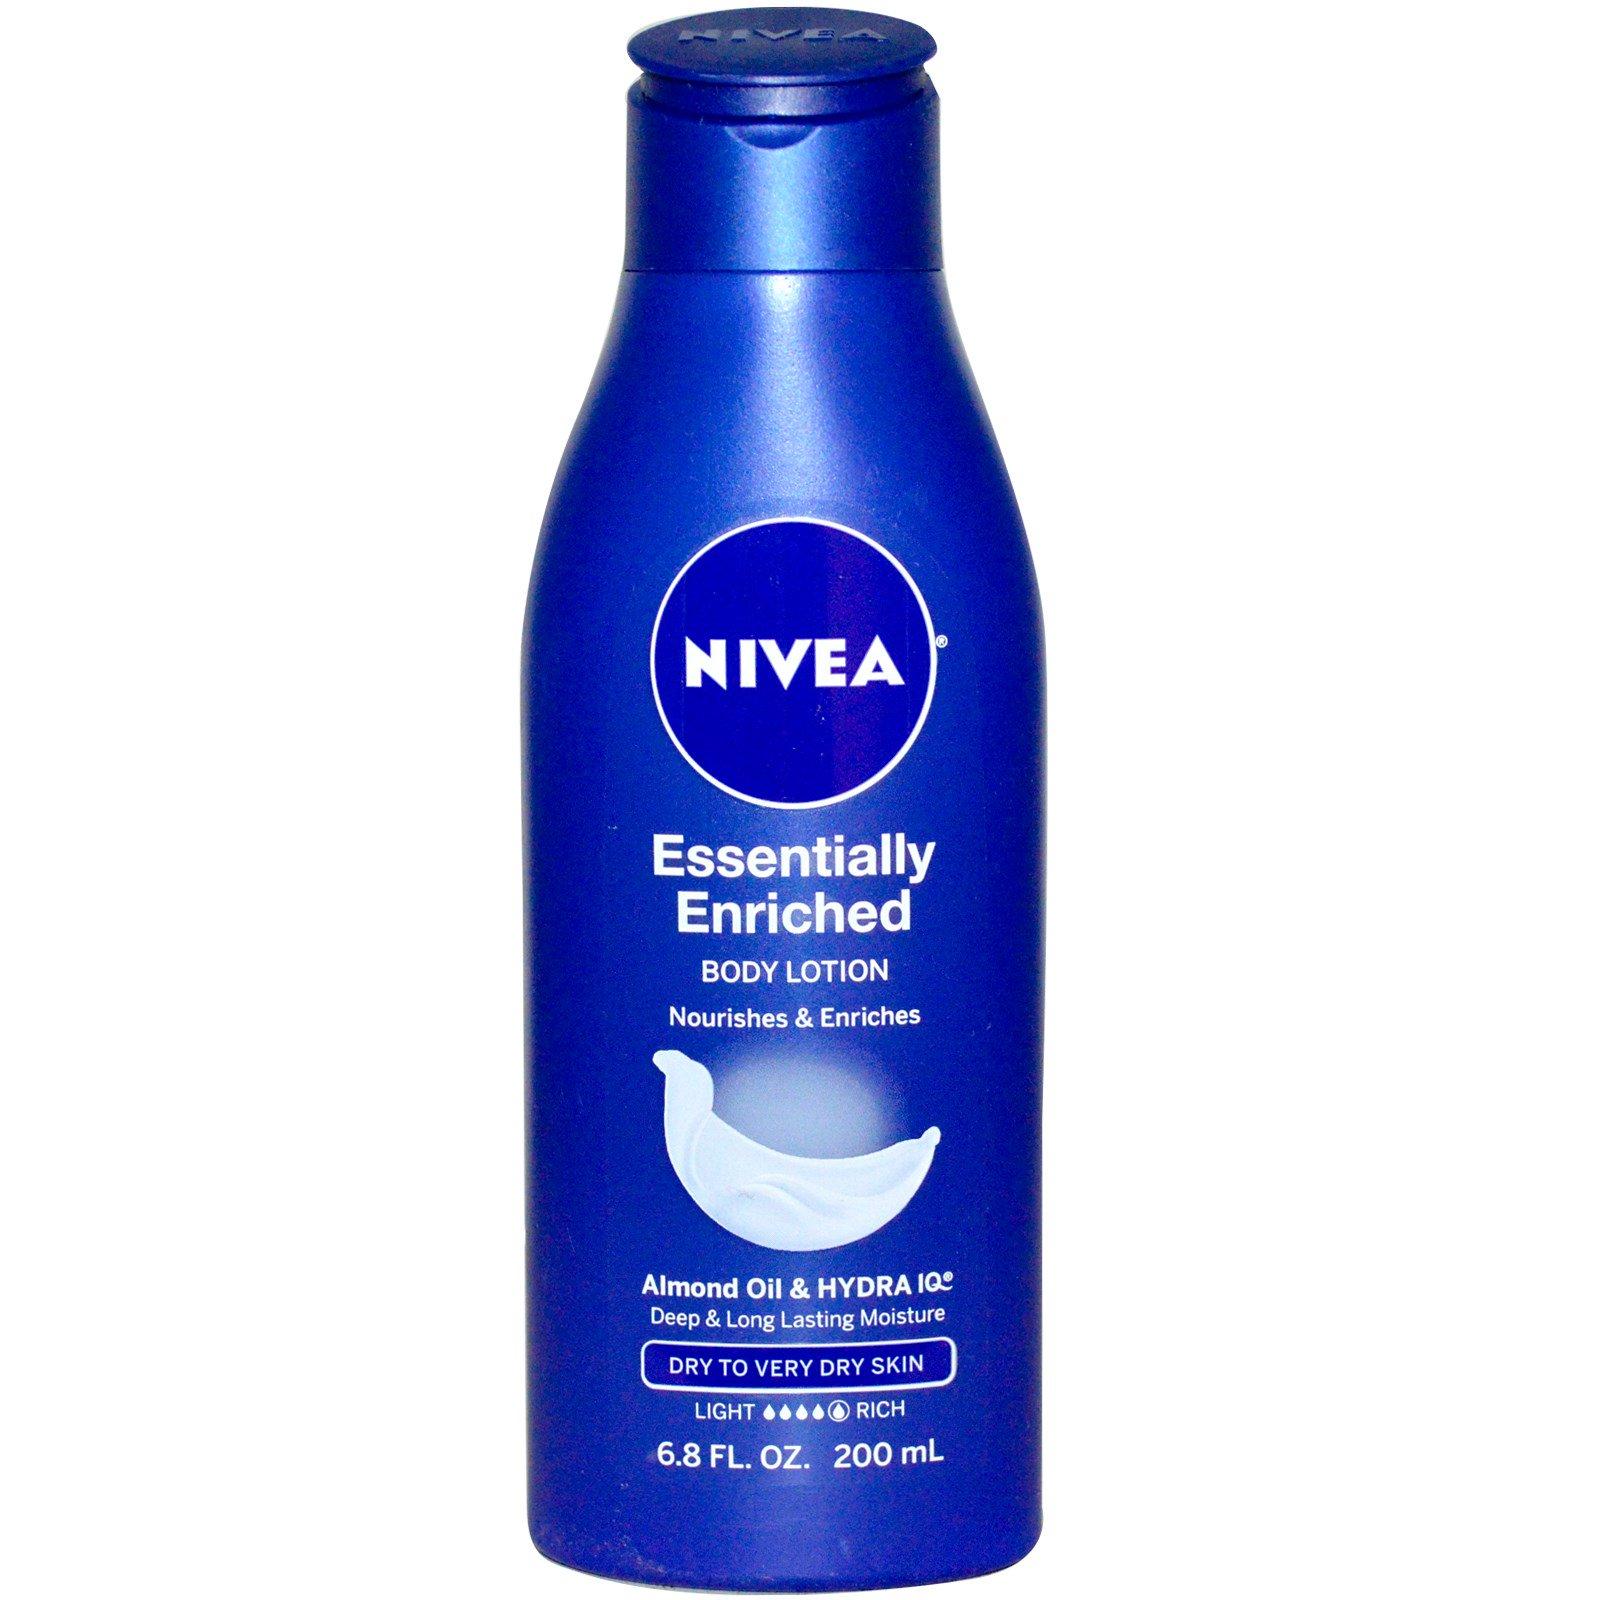 nivea essentially enriched body lotion almond oil. Black Bedroom Furniture Sets. Home Design Ideas